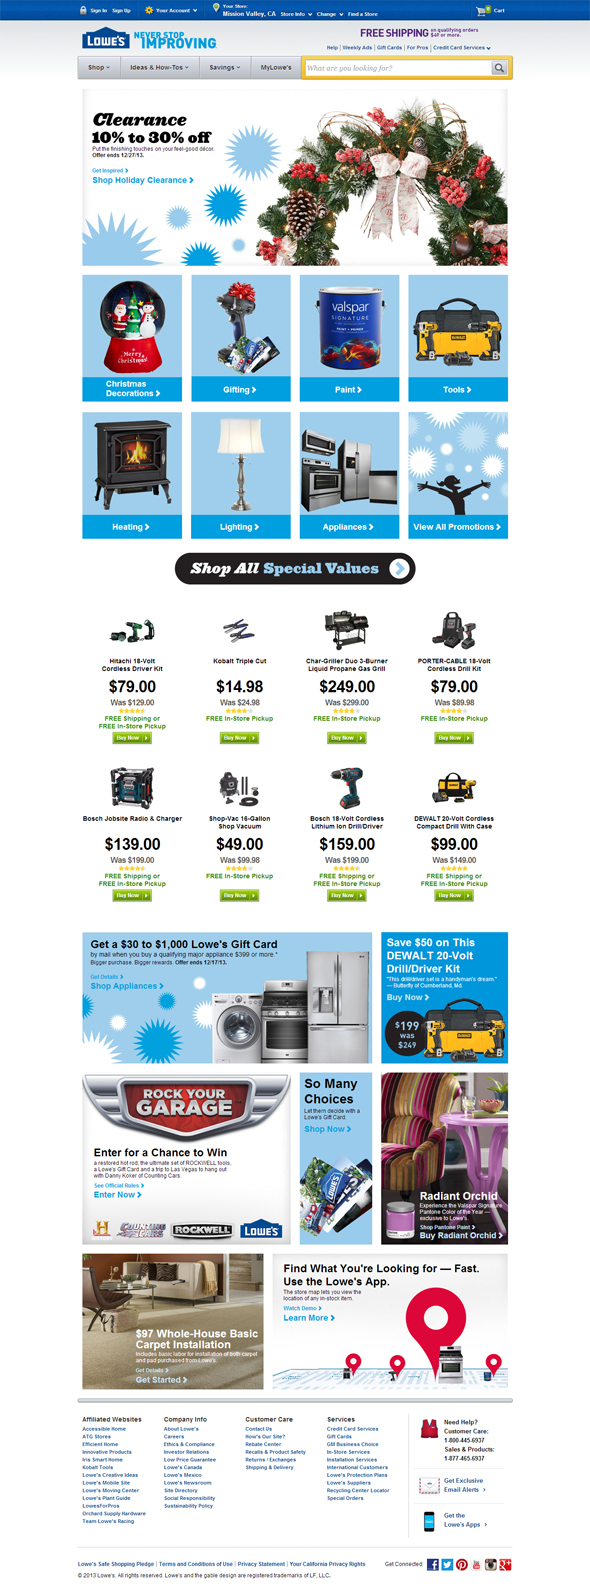 Lowe-s-Home-Improvement--Appliances--Tools--Hardware--Paint--Flooring